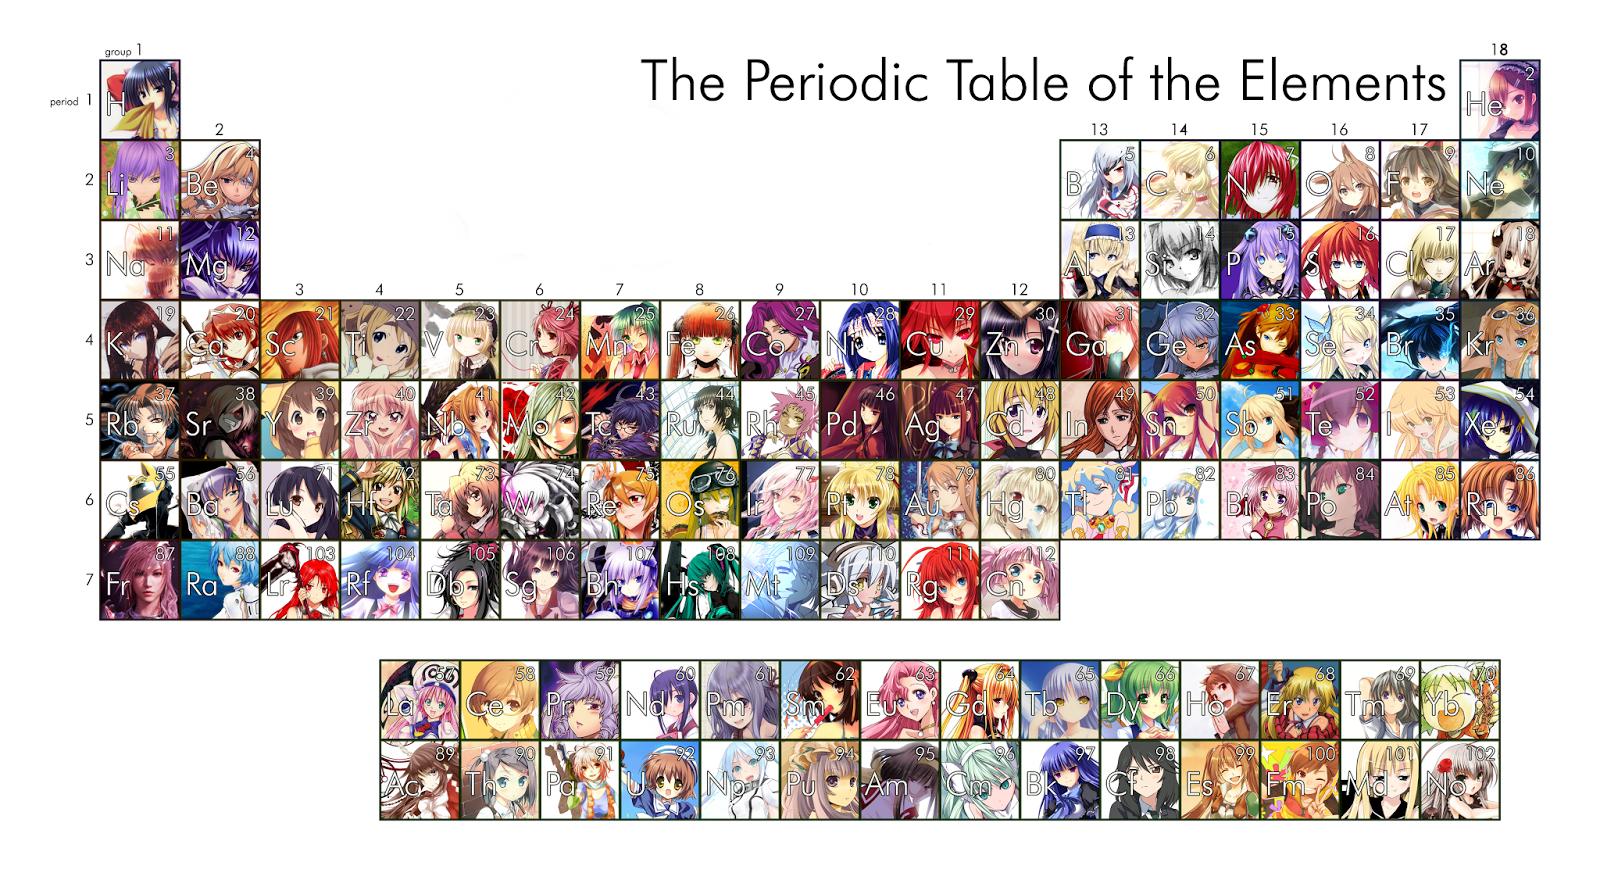 Tabla peridica de chicas anime el coloquio de las musas lista de chicas anime dentro de esta tabla peridica urtaz Images